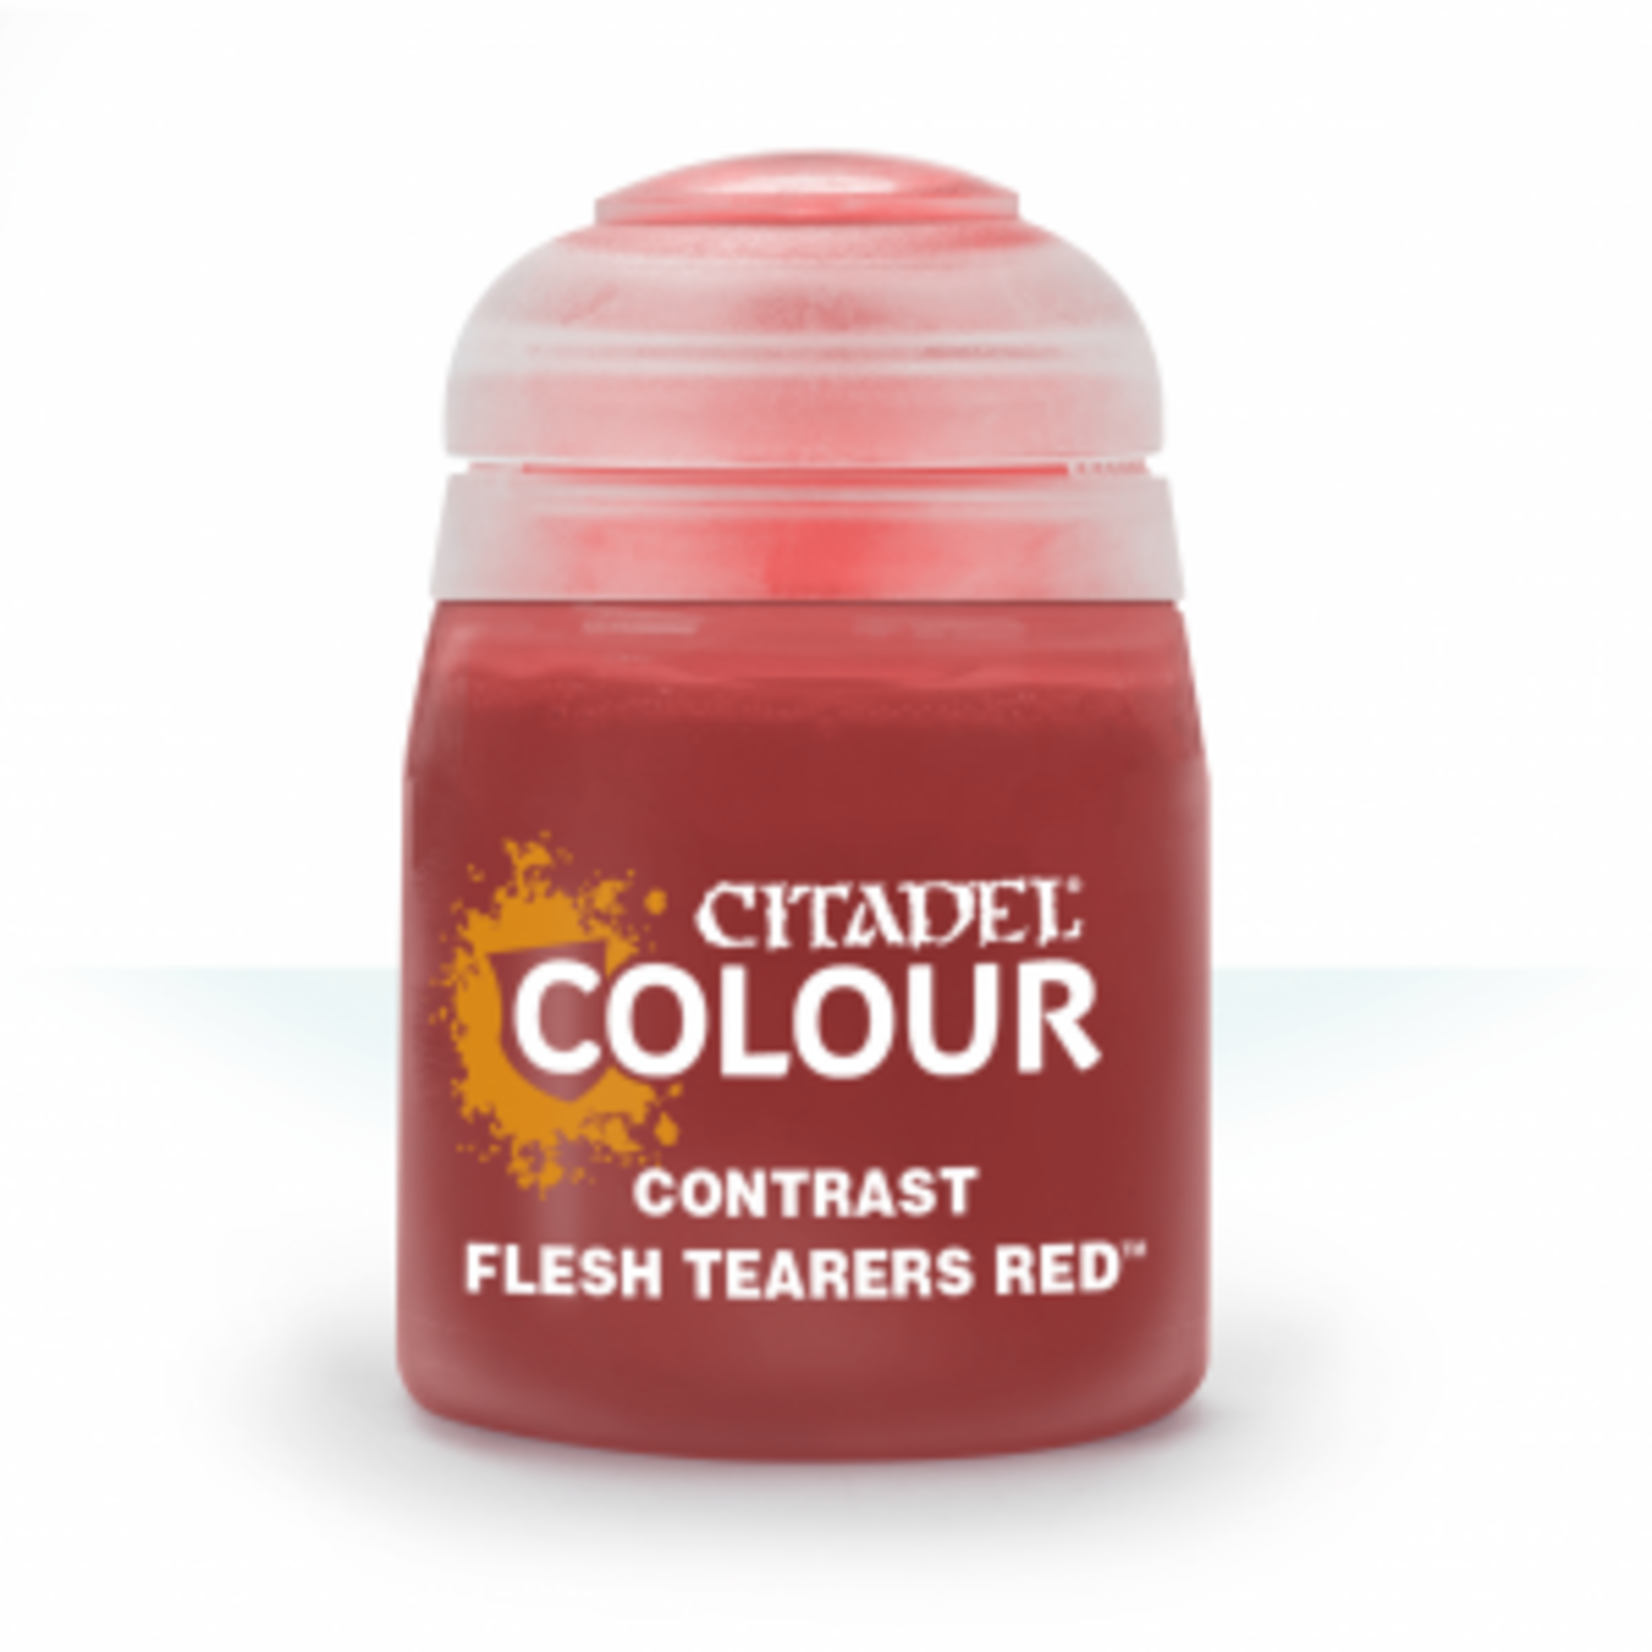 Citadel Contrast Flesh Tearers Red